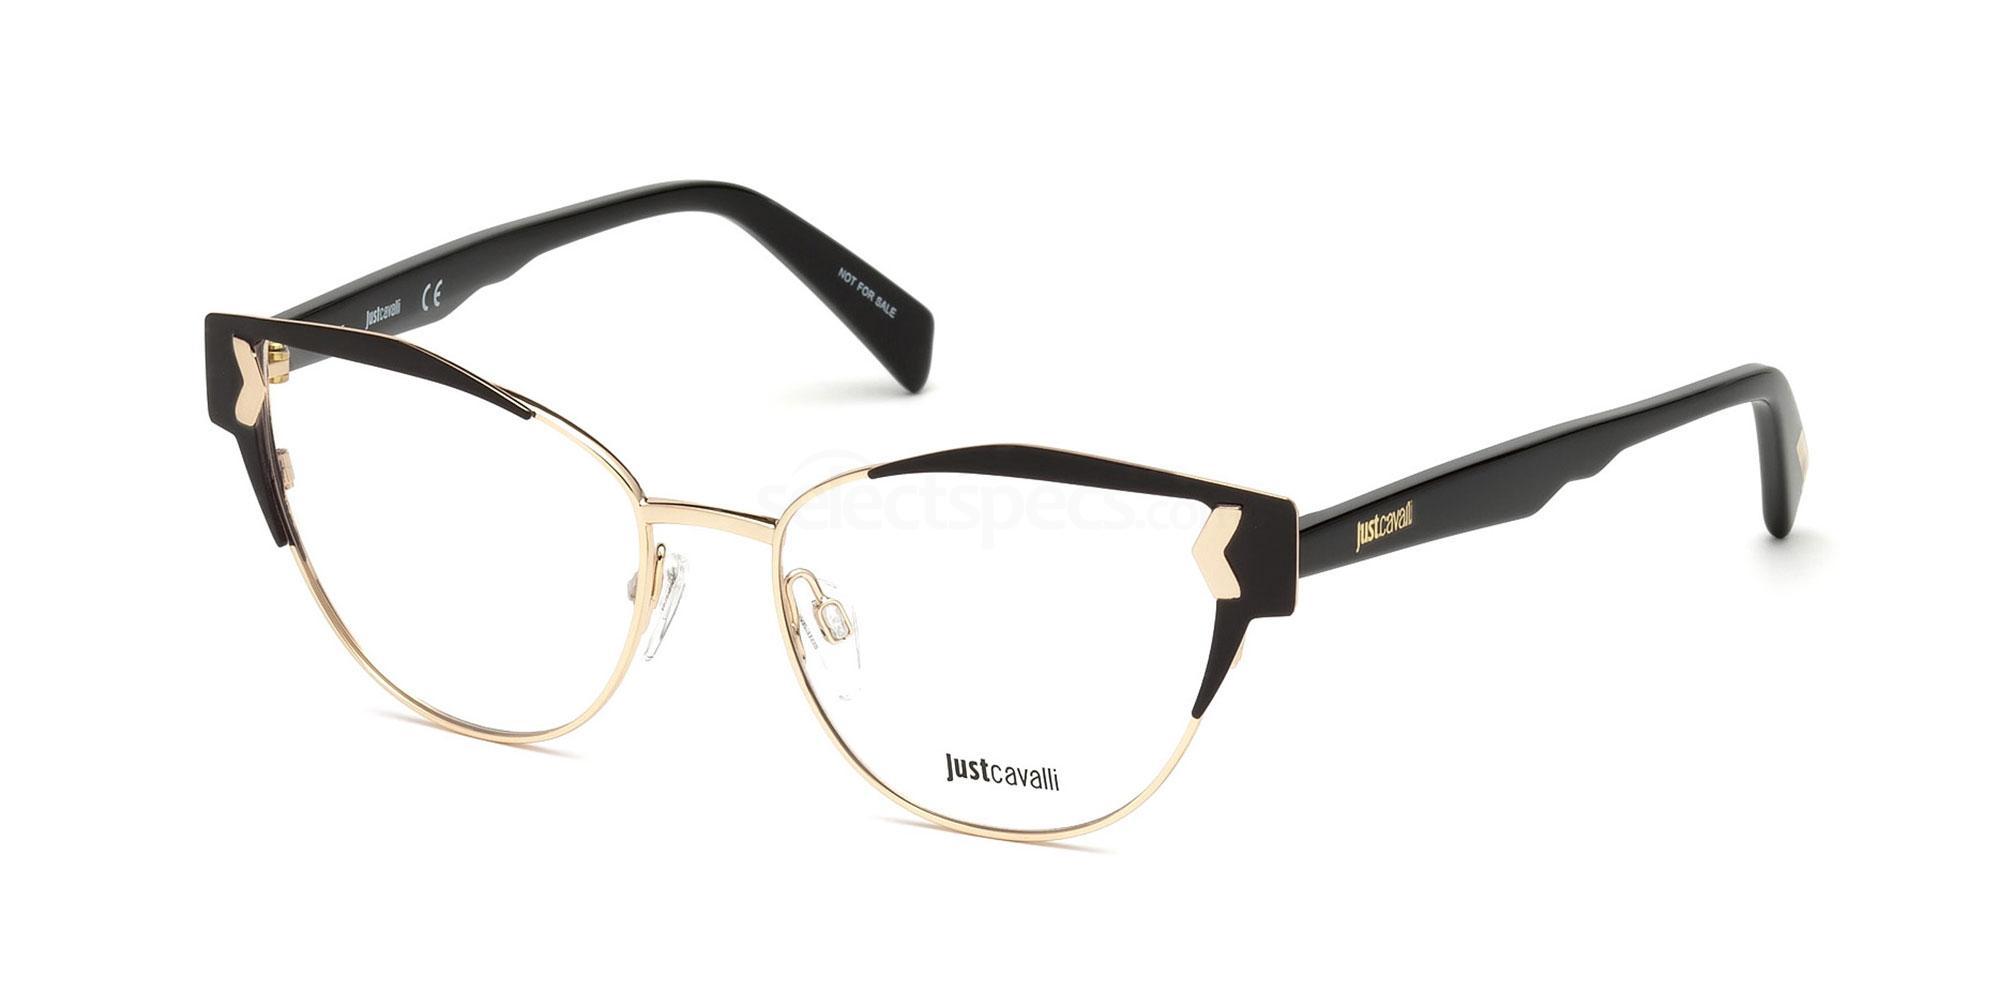 028 JC0816 Glasses, Just Cavalli